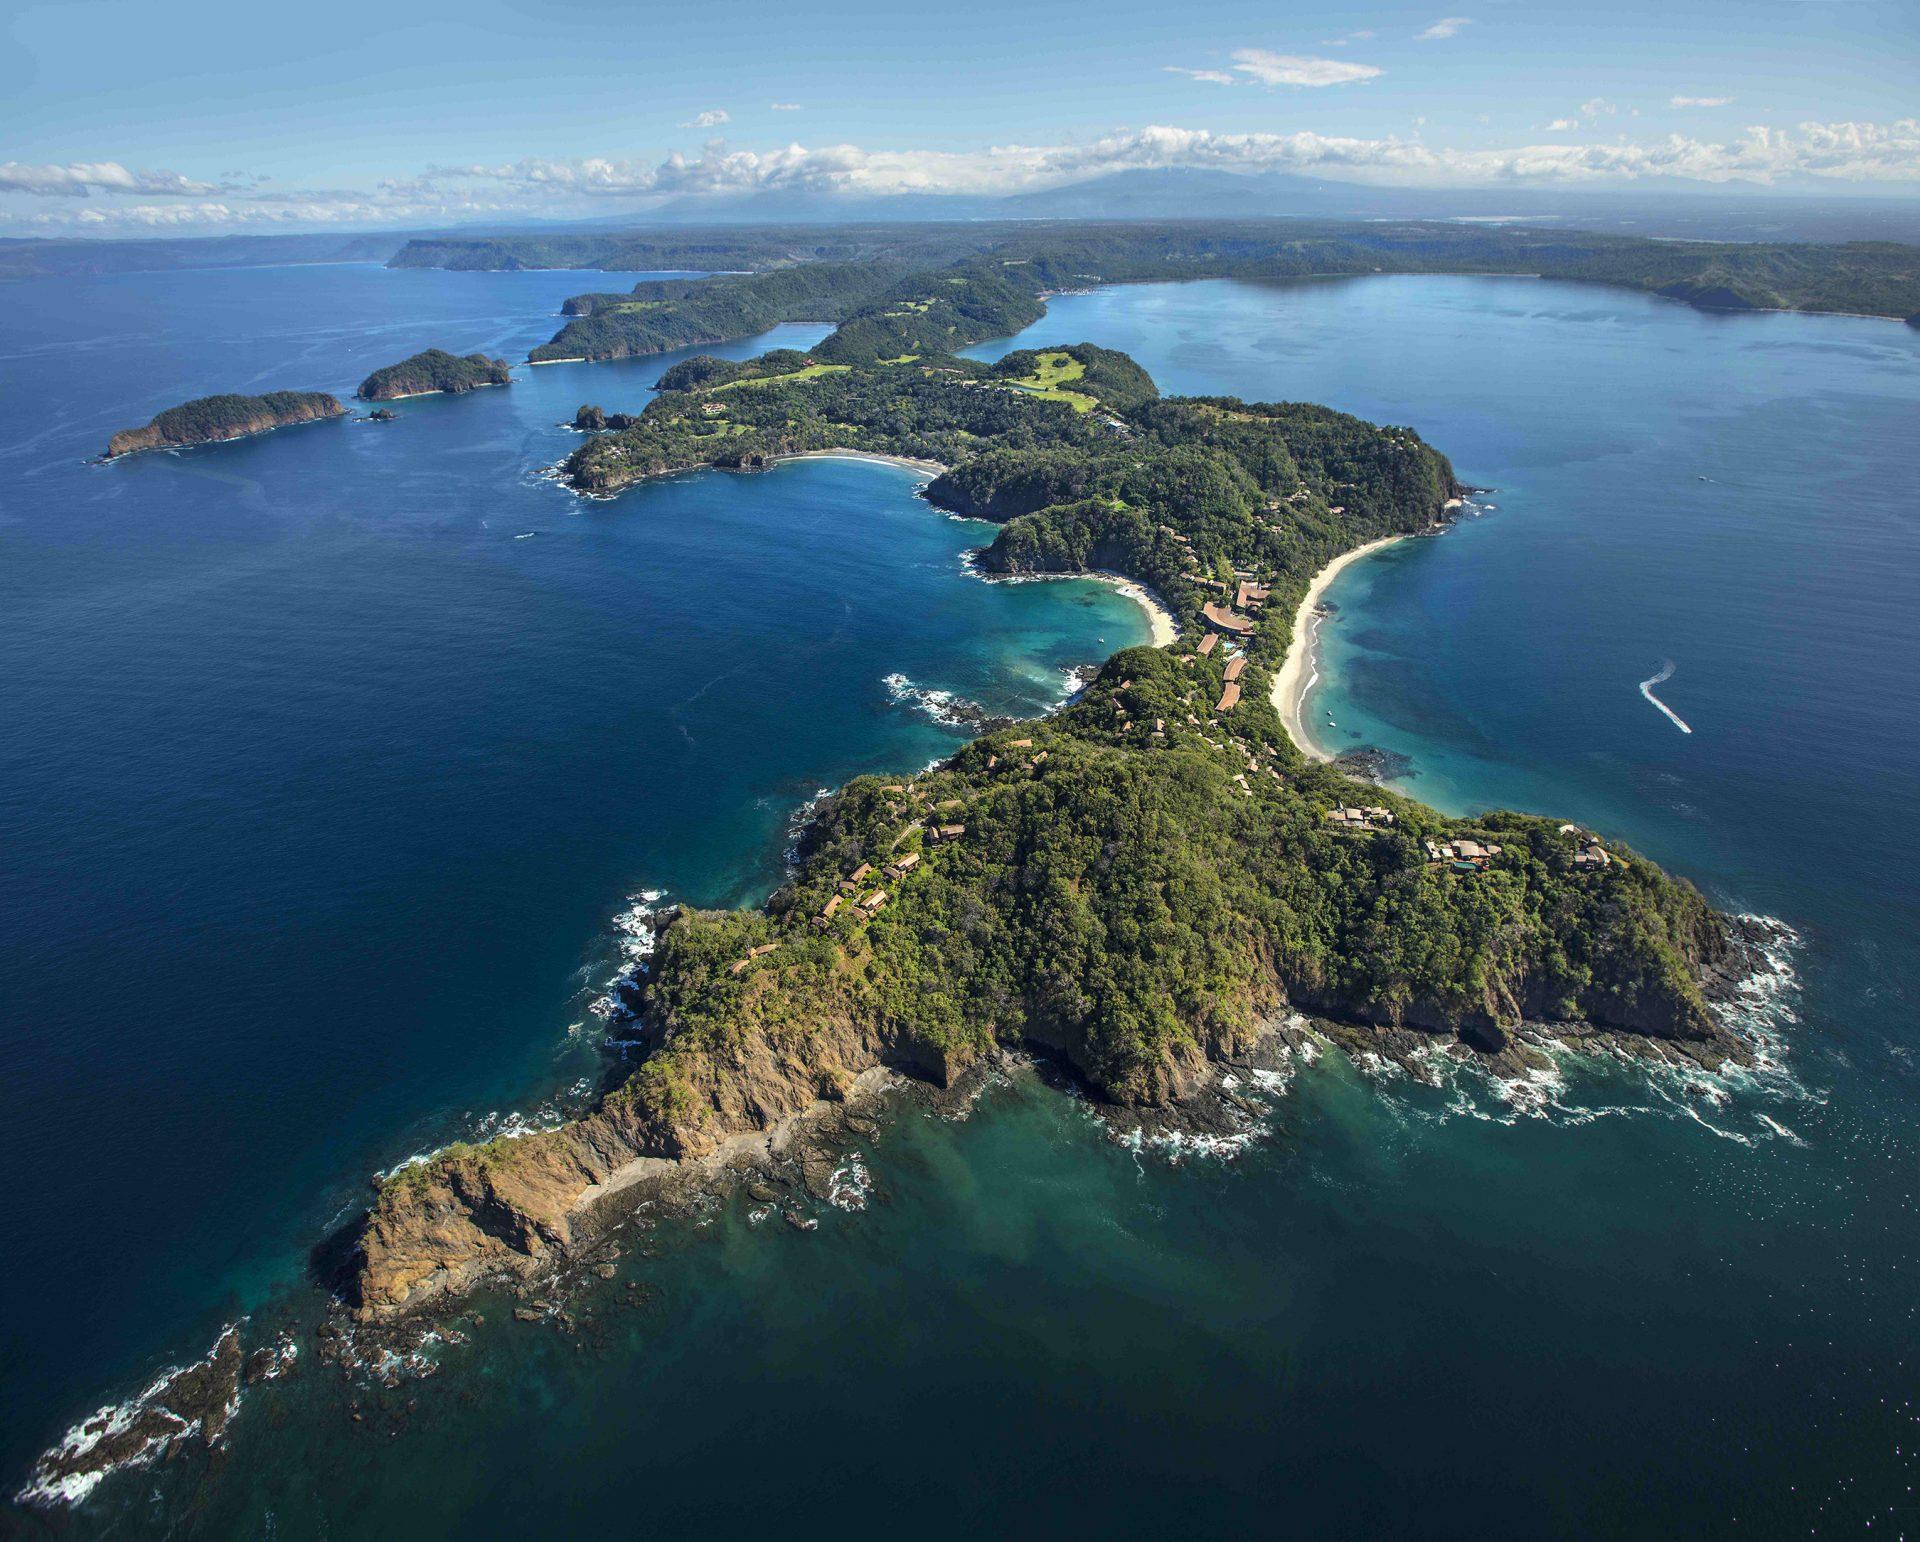 $35m 're-imagination' for Four Seasons Resort Costa Rica